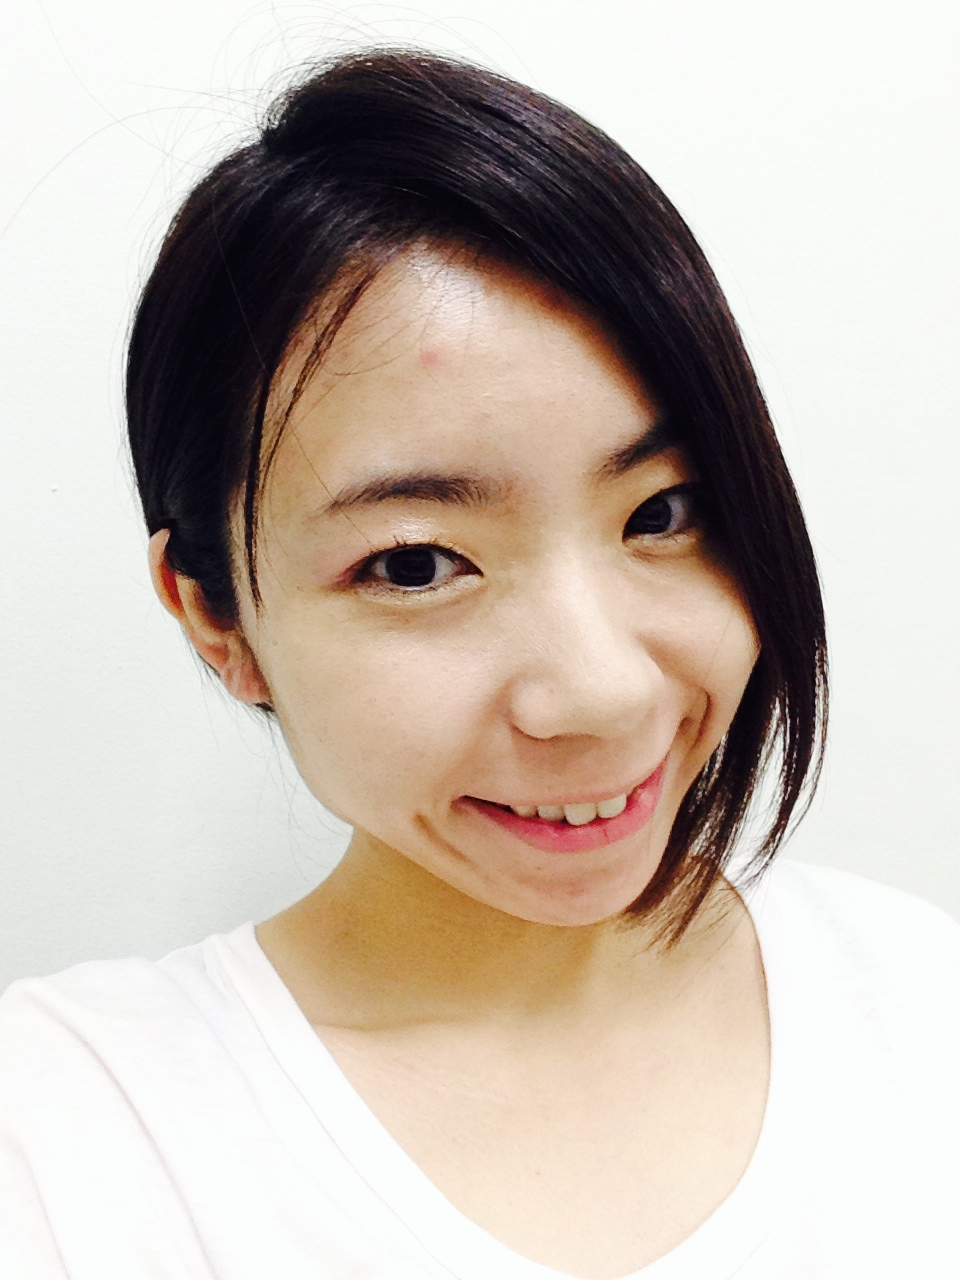 AGNIYOGA 新中野店 - Naomi(ナオミ)さんの写真